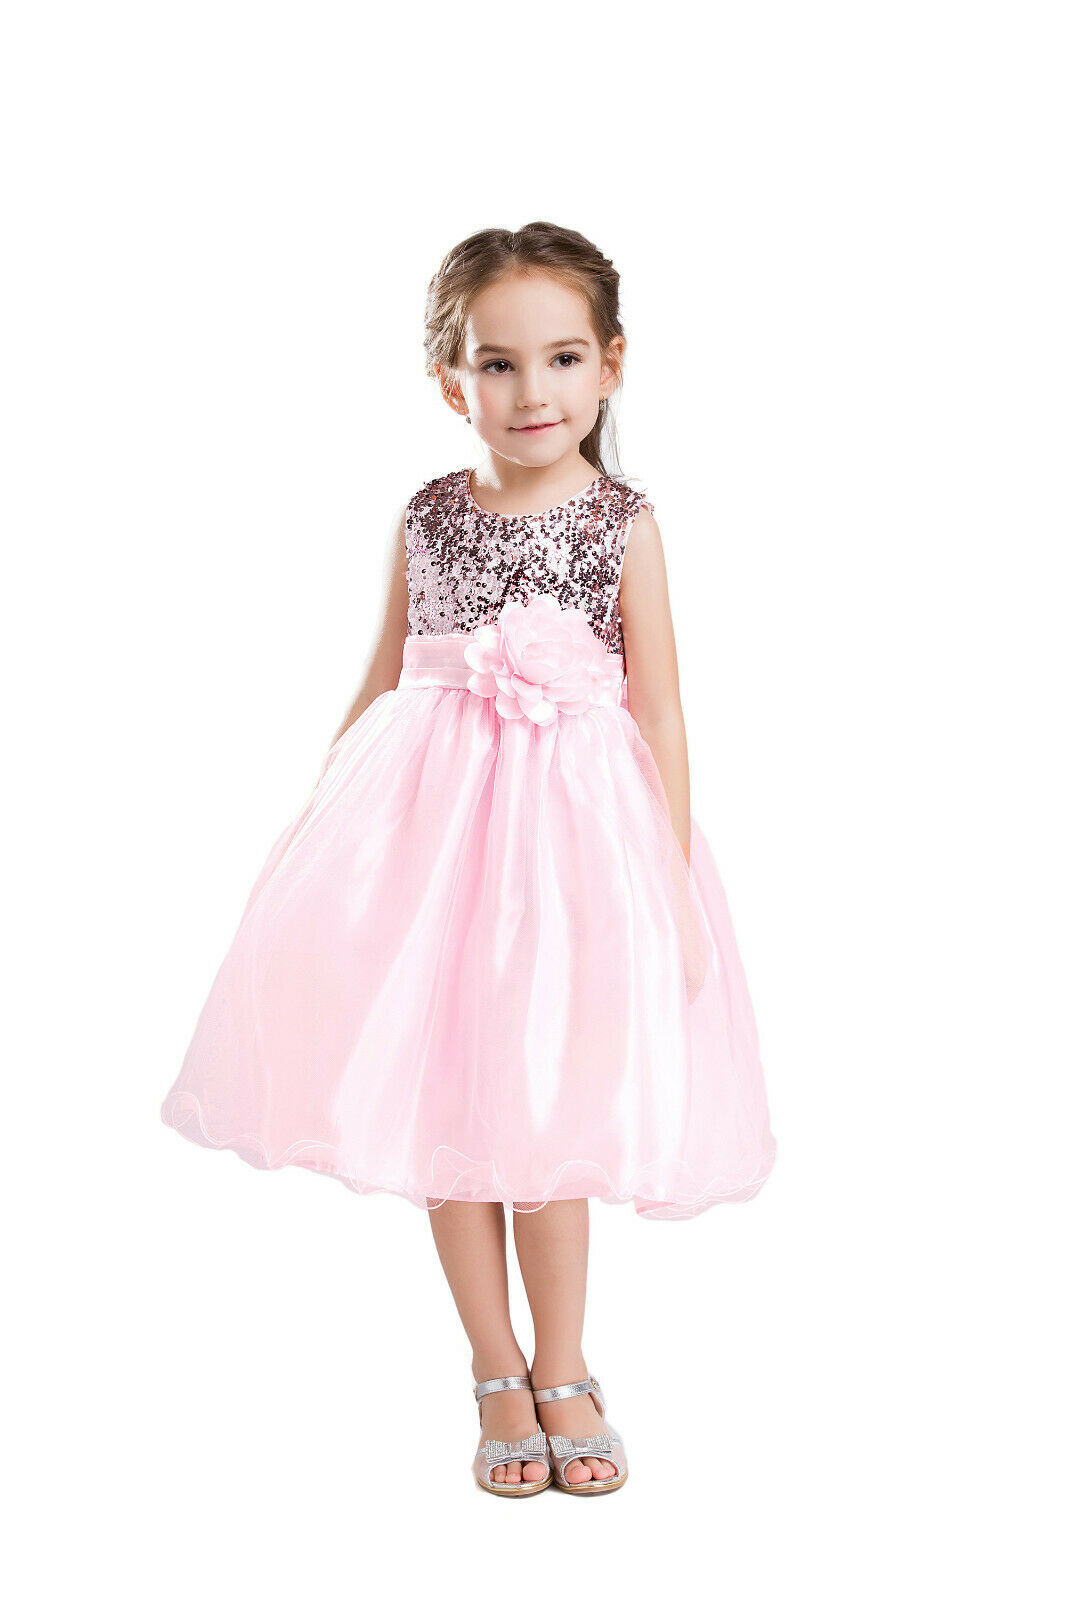 ELSA & ANNA® Girl Princess Wedding Bridesmaid Party Dress Costume Outfit PDPNK03